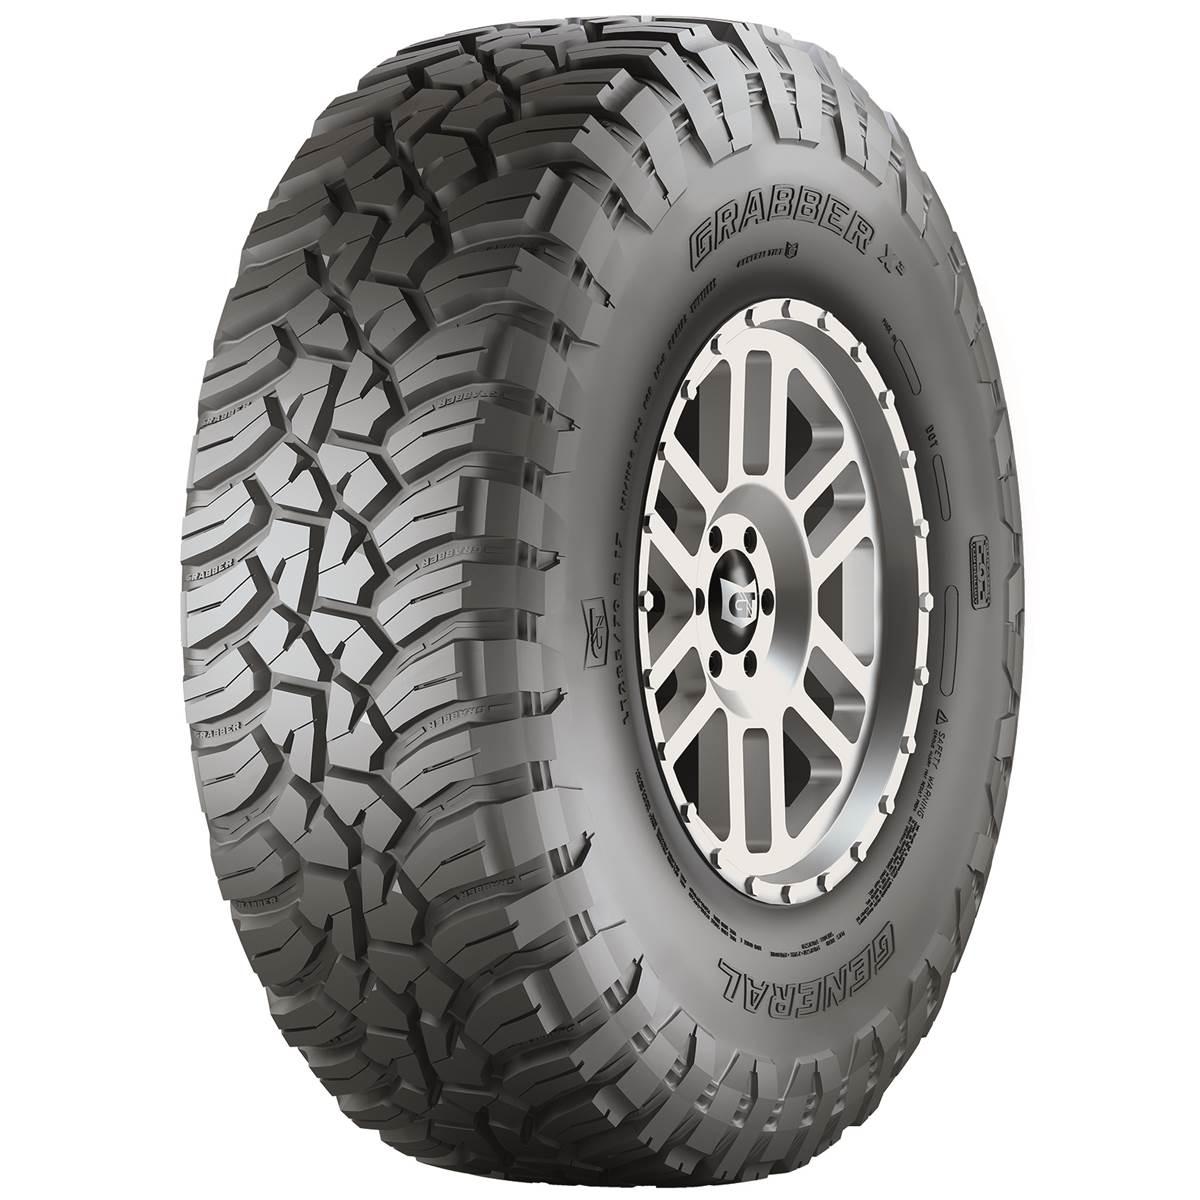 Pneu 4X4 Général tire 205/0R16 110Q Grabber X3